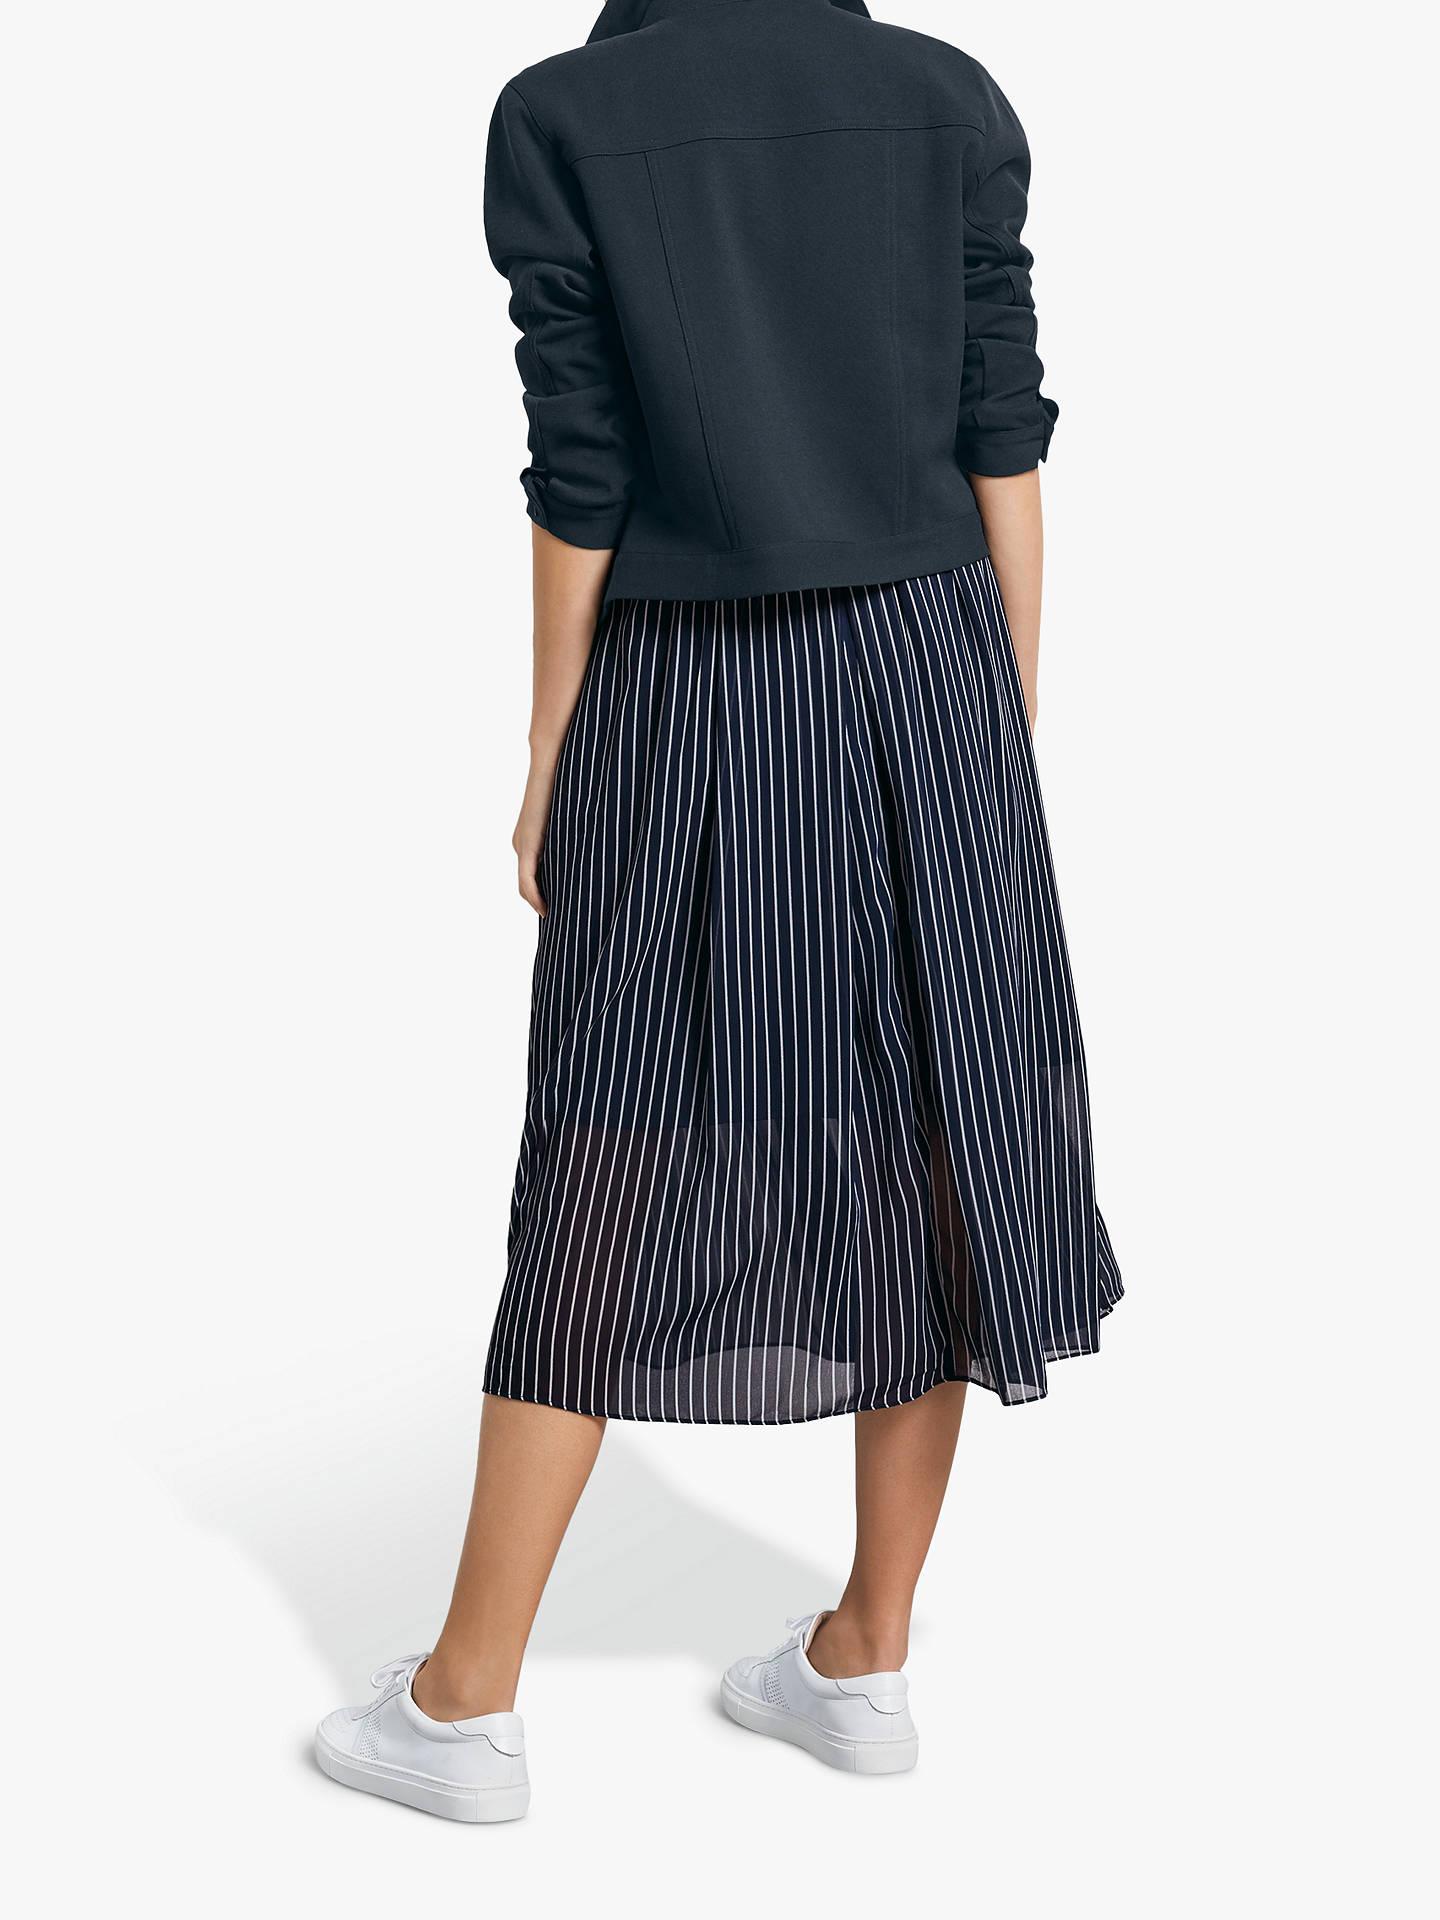 e1ac4d204 ... Buy hush Marina Stripe Midi Skirt, Midnight Blue/White, 8 Online at  johnlewis ...